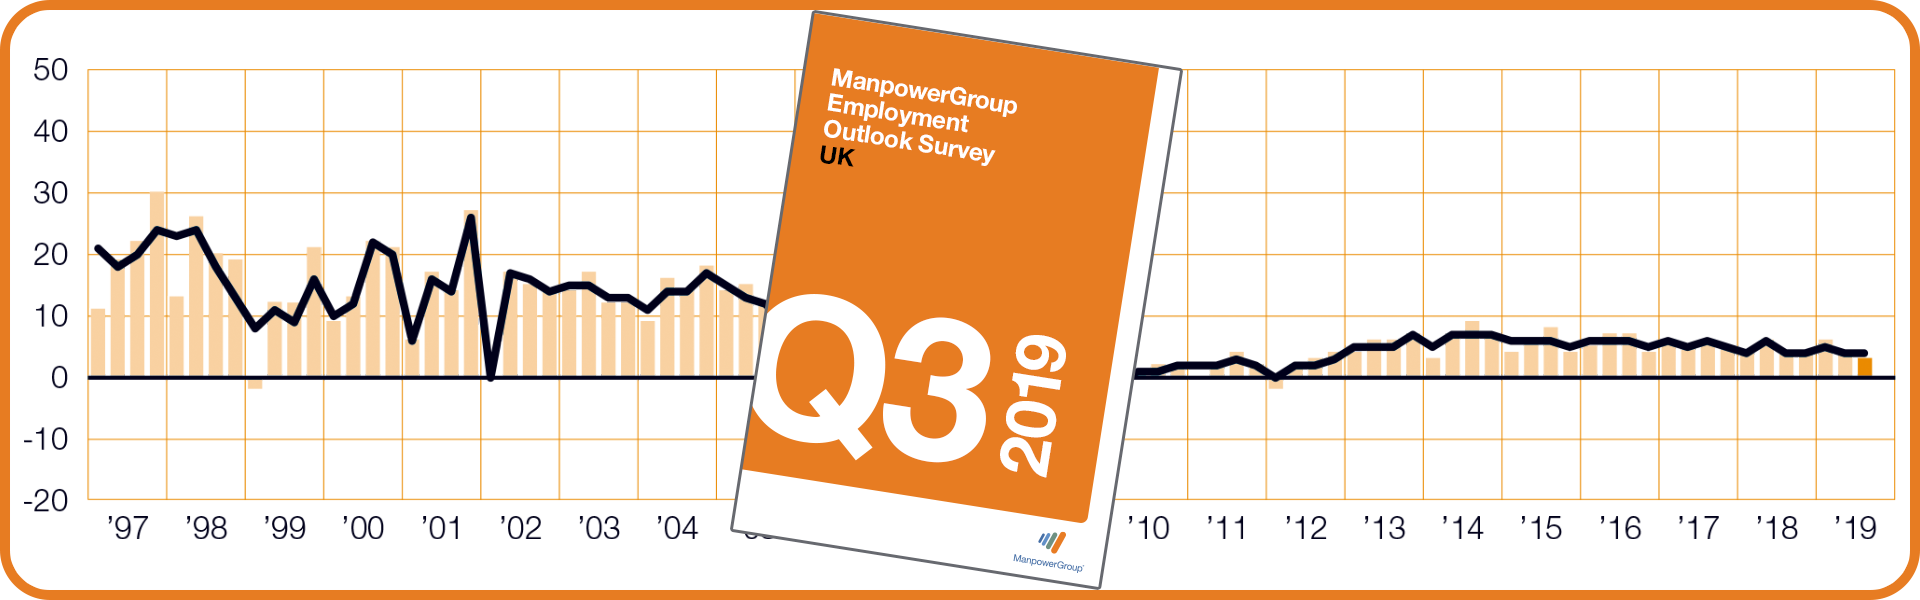 ManpowerGroup Employment Outlook Survey - Q3 2019